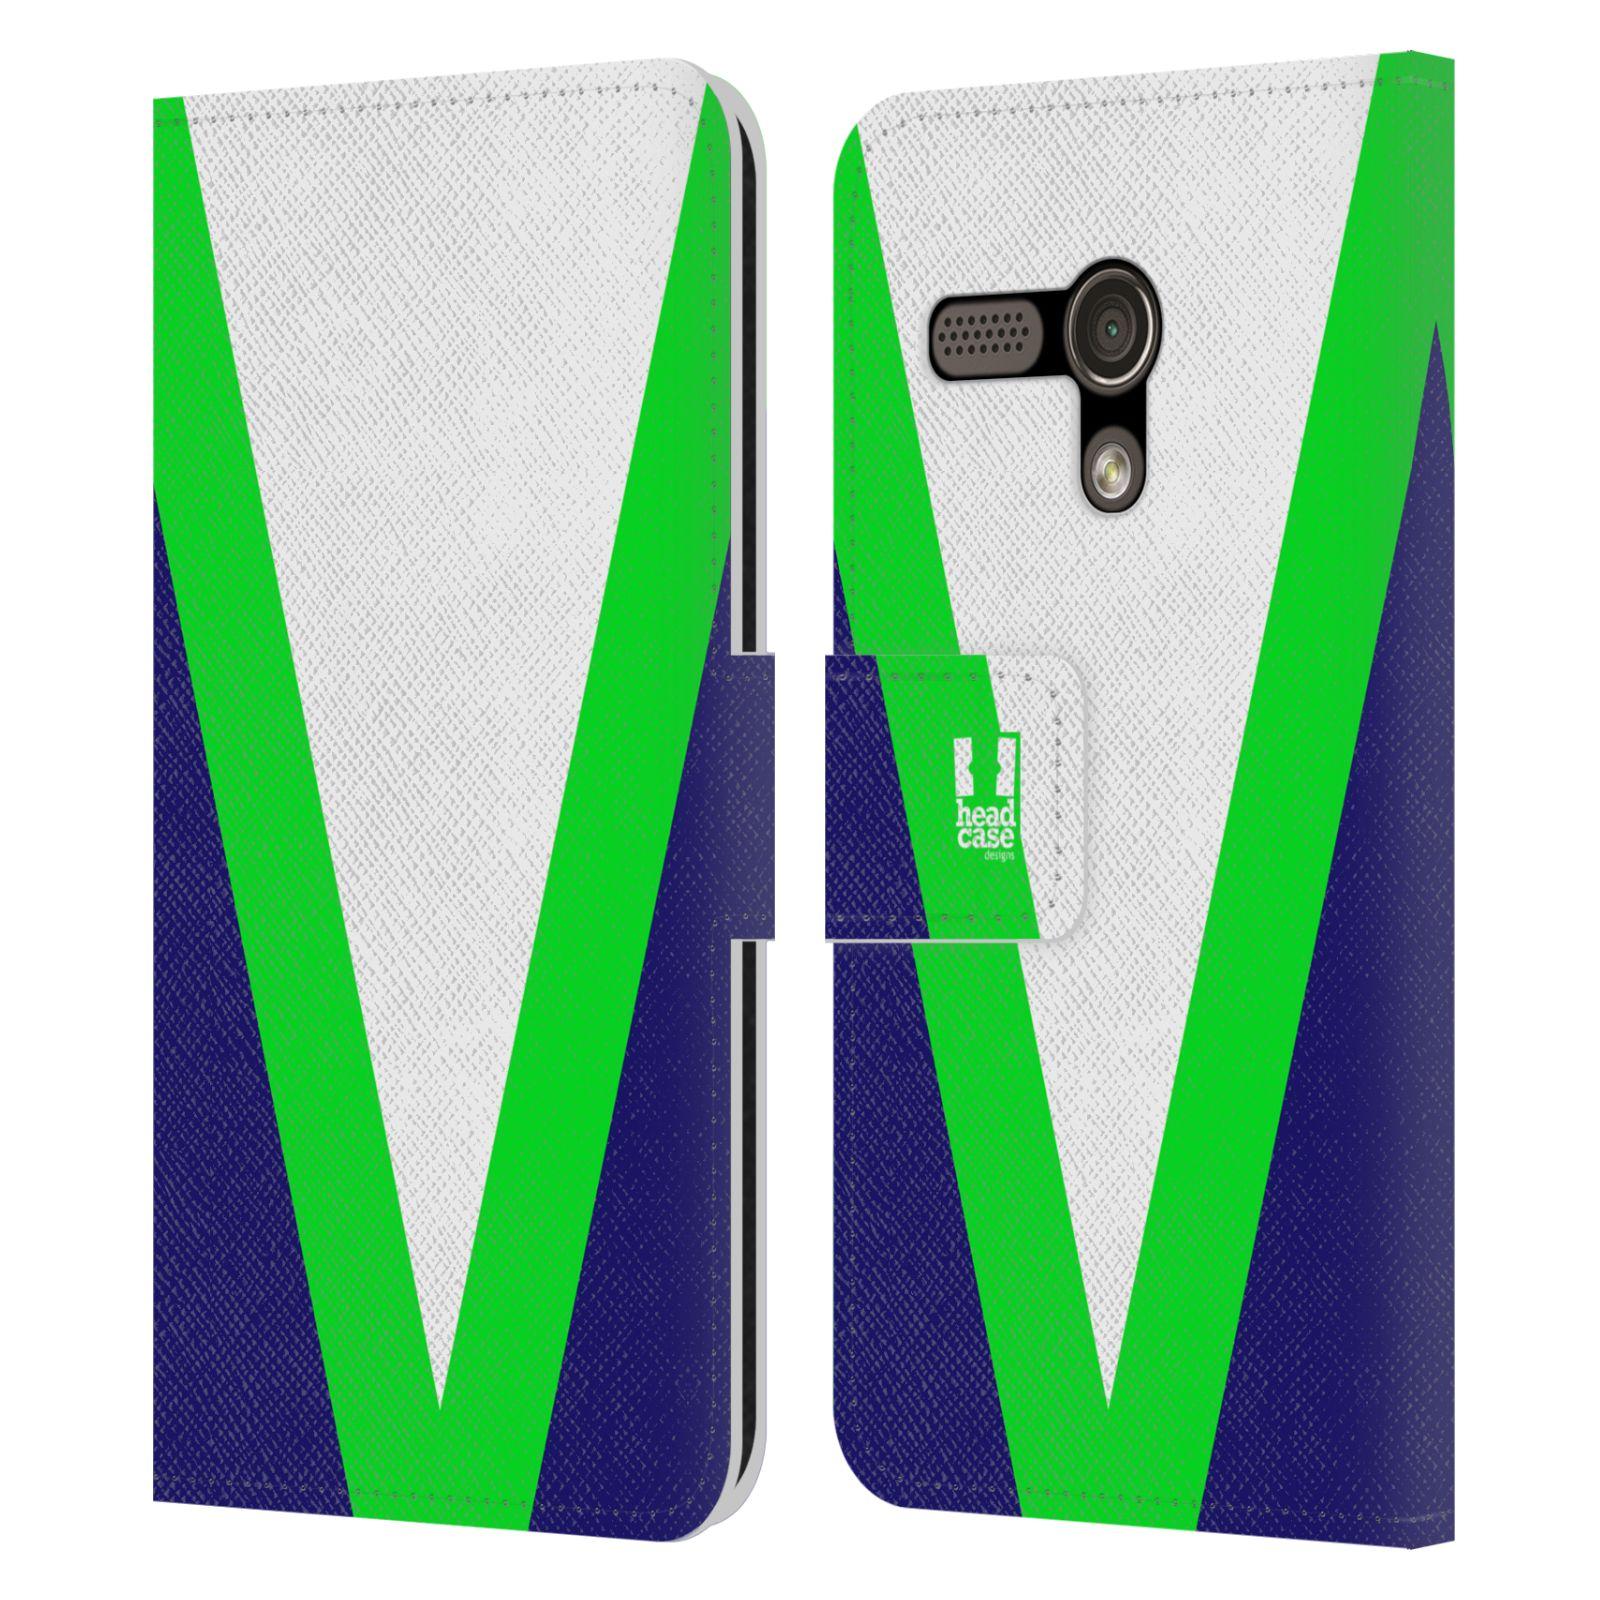 HEAD CASE Flipové pouzdro pro mobil Motorola MOTO G barevné tvary zelená a modrá